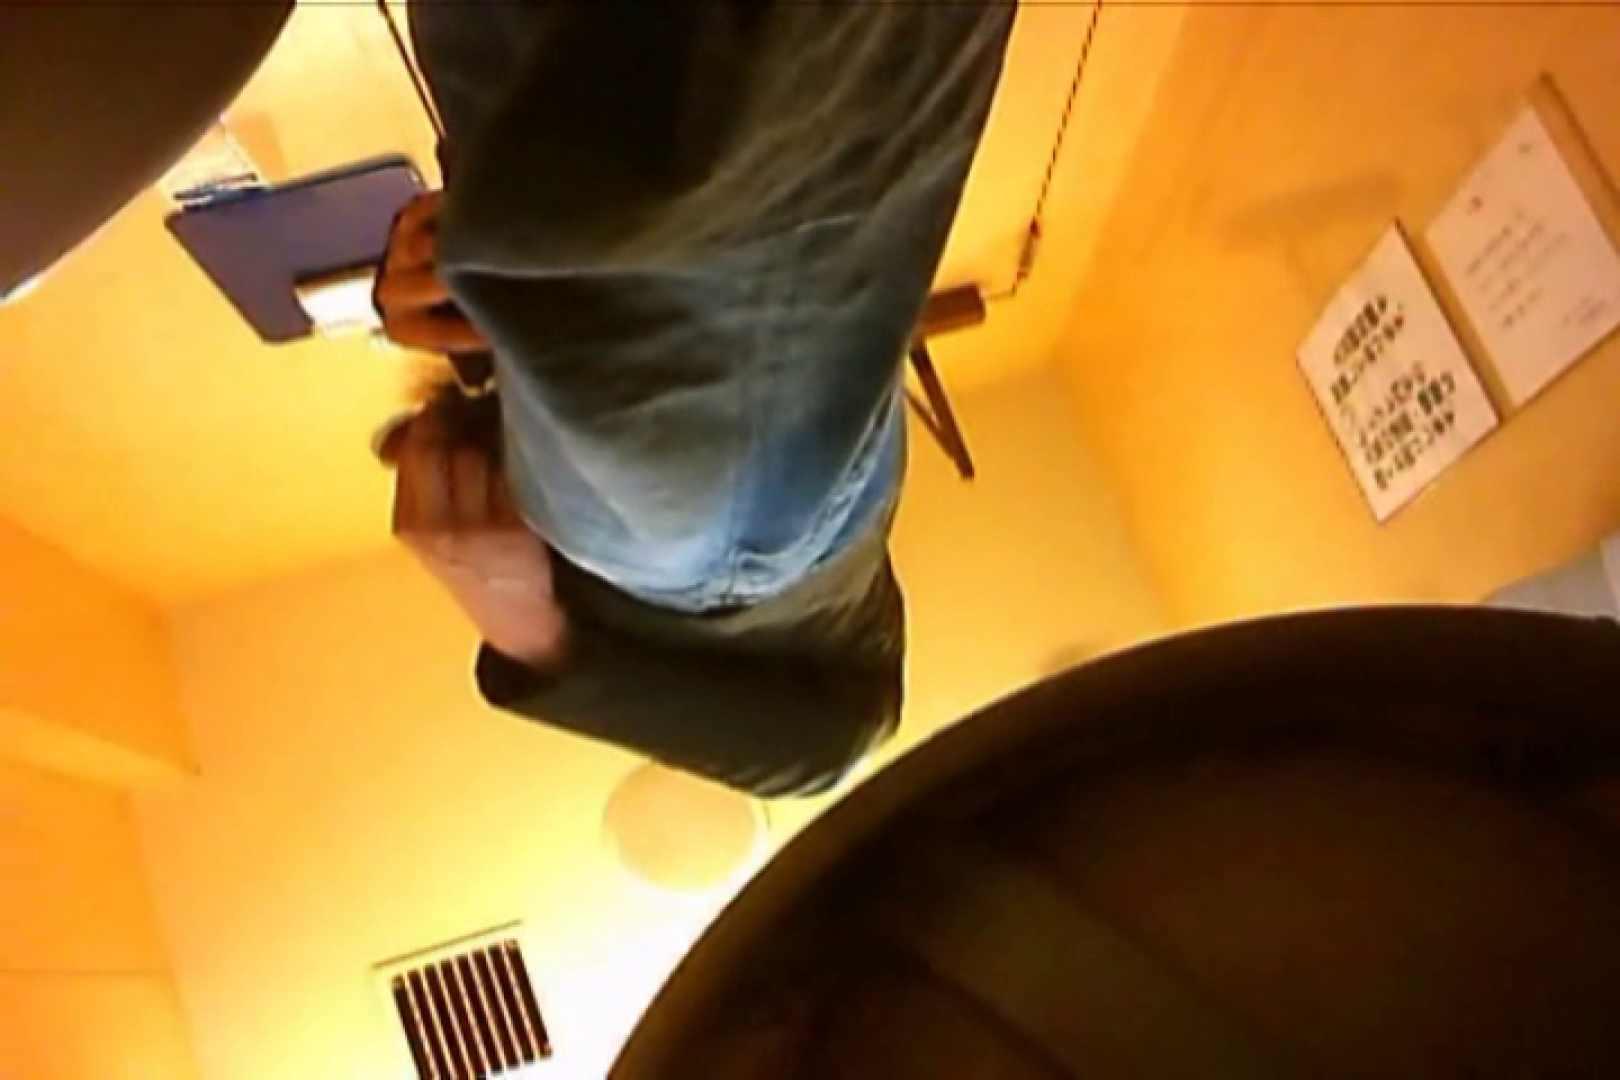 SEASON 2ND!掴み取りさんの洗面所覗き!in新幹線!VOL.03 ノンケ  84連発 80